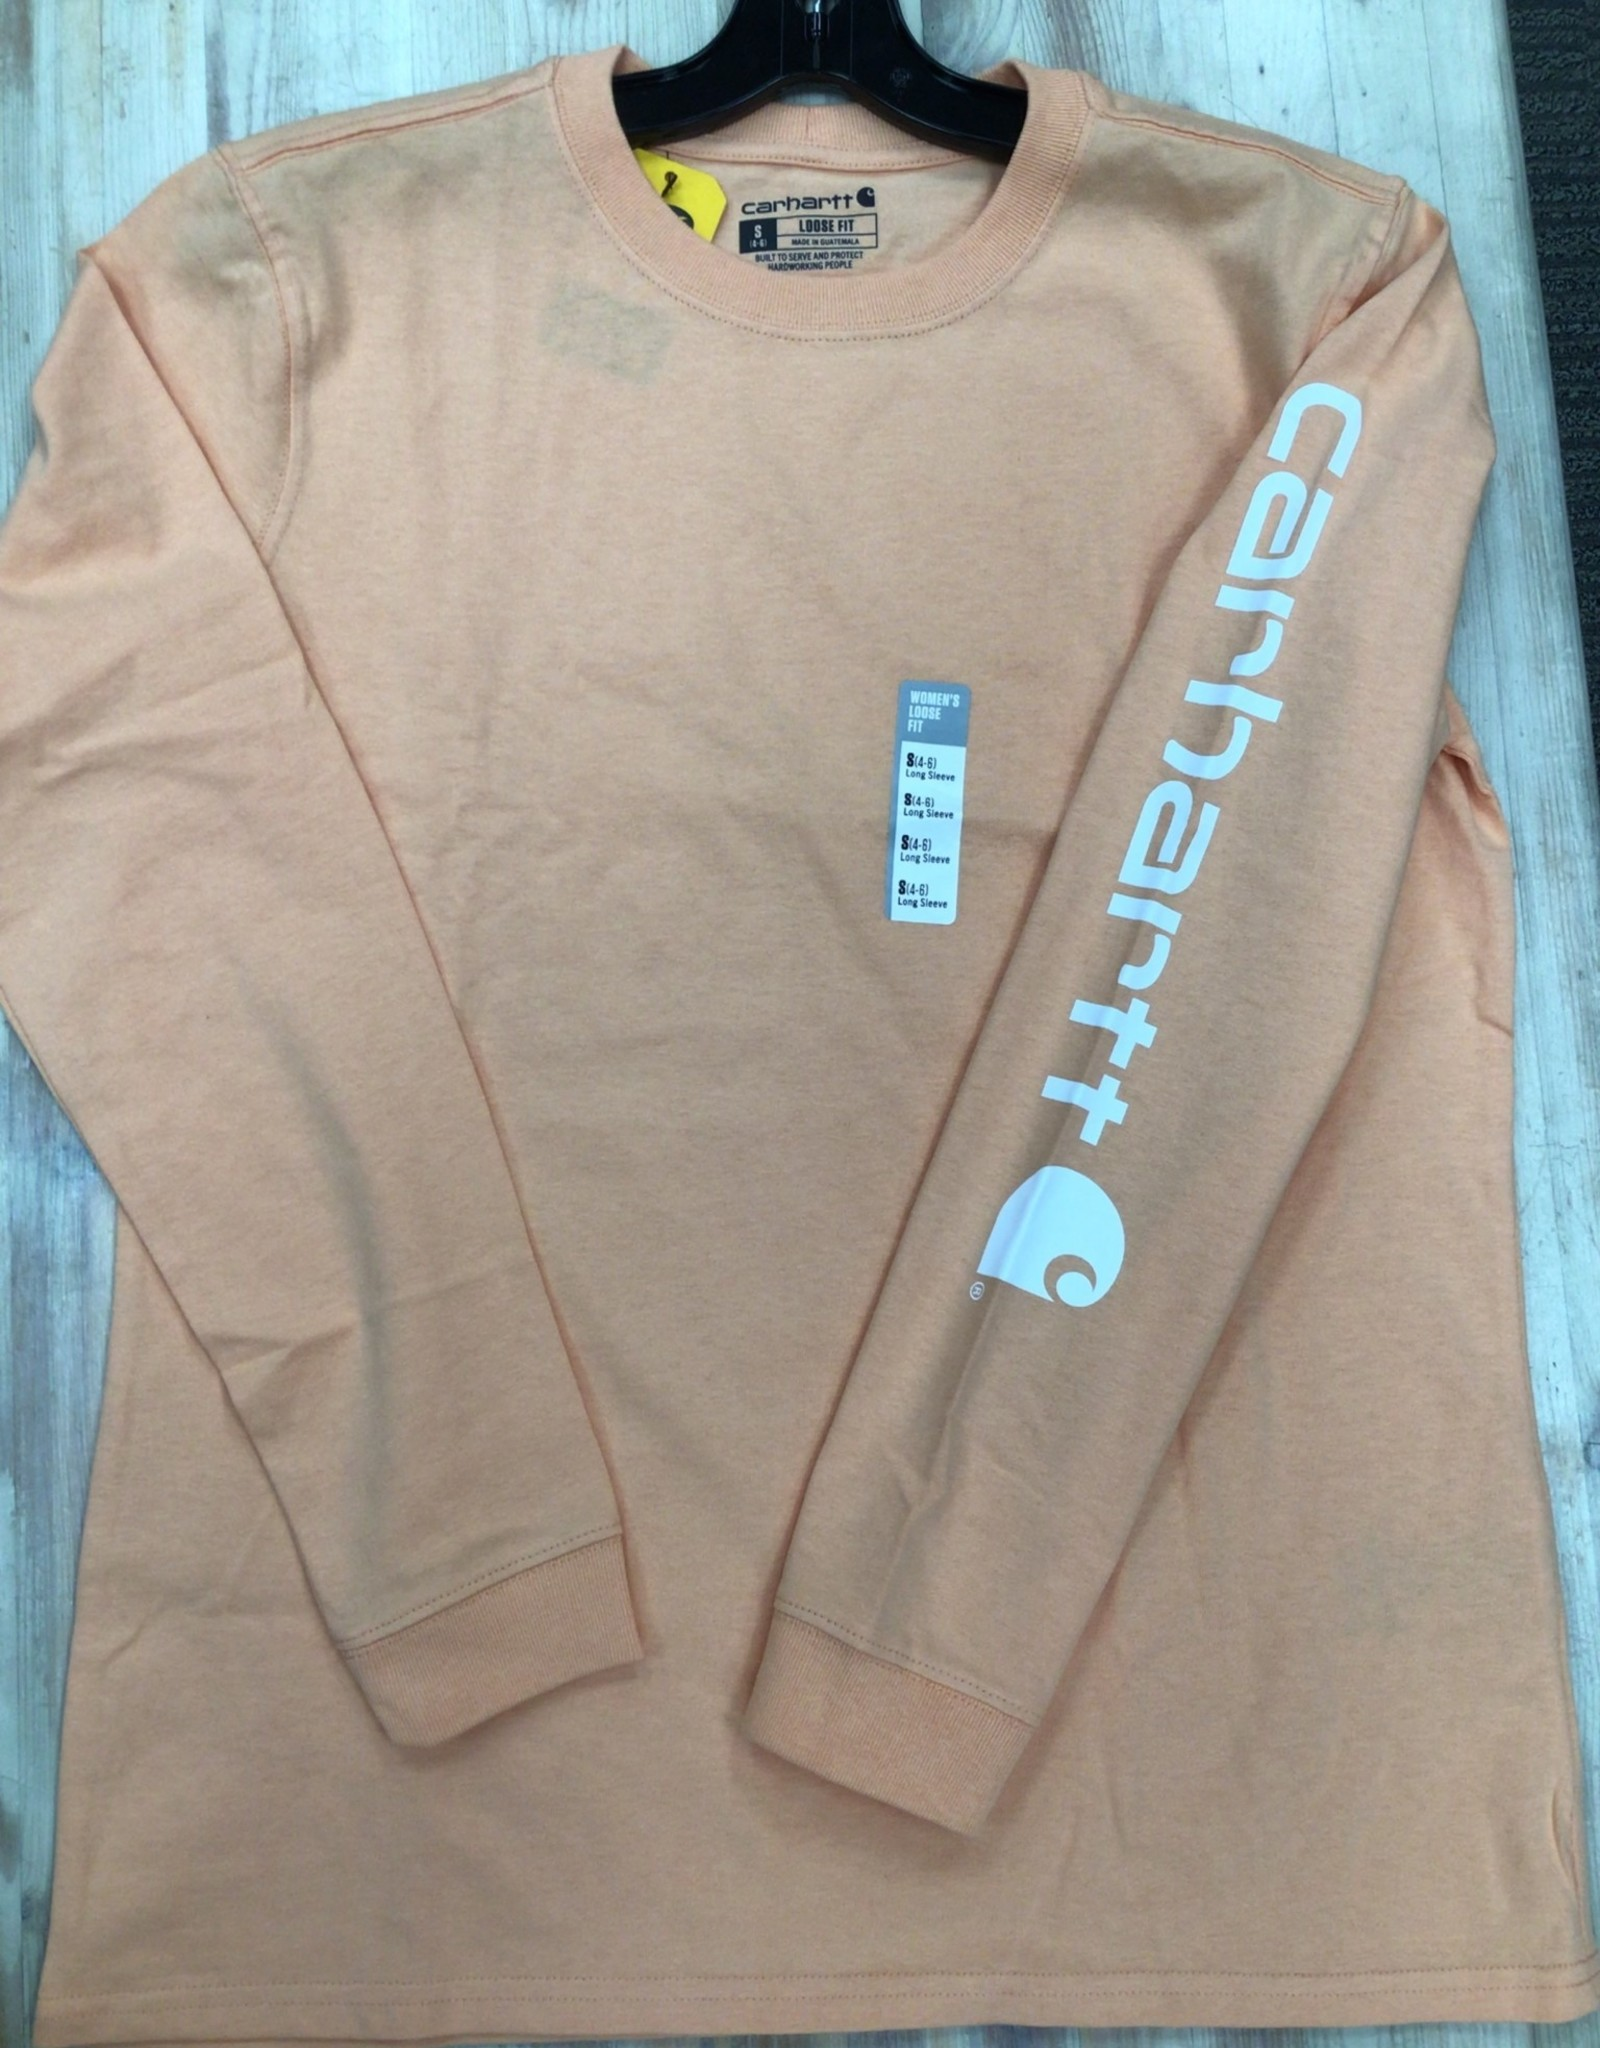 Carhartt Carhartt 103401 Loose Fit Heavyweight Long Sleeve Logo Sleeve Graphic T-Shirt Ladies'